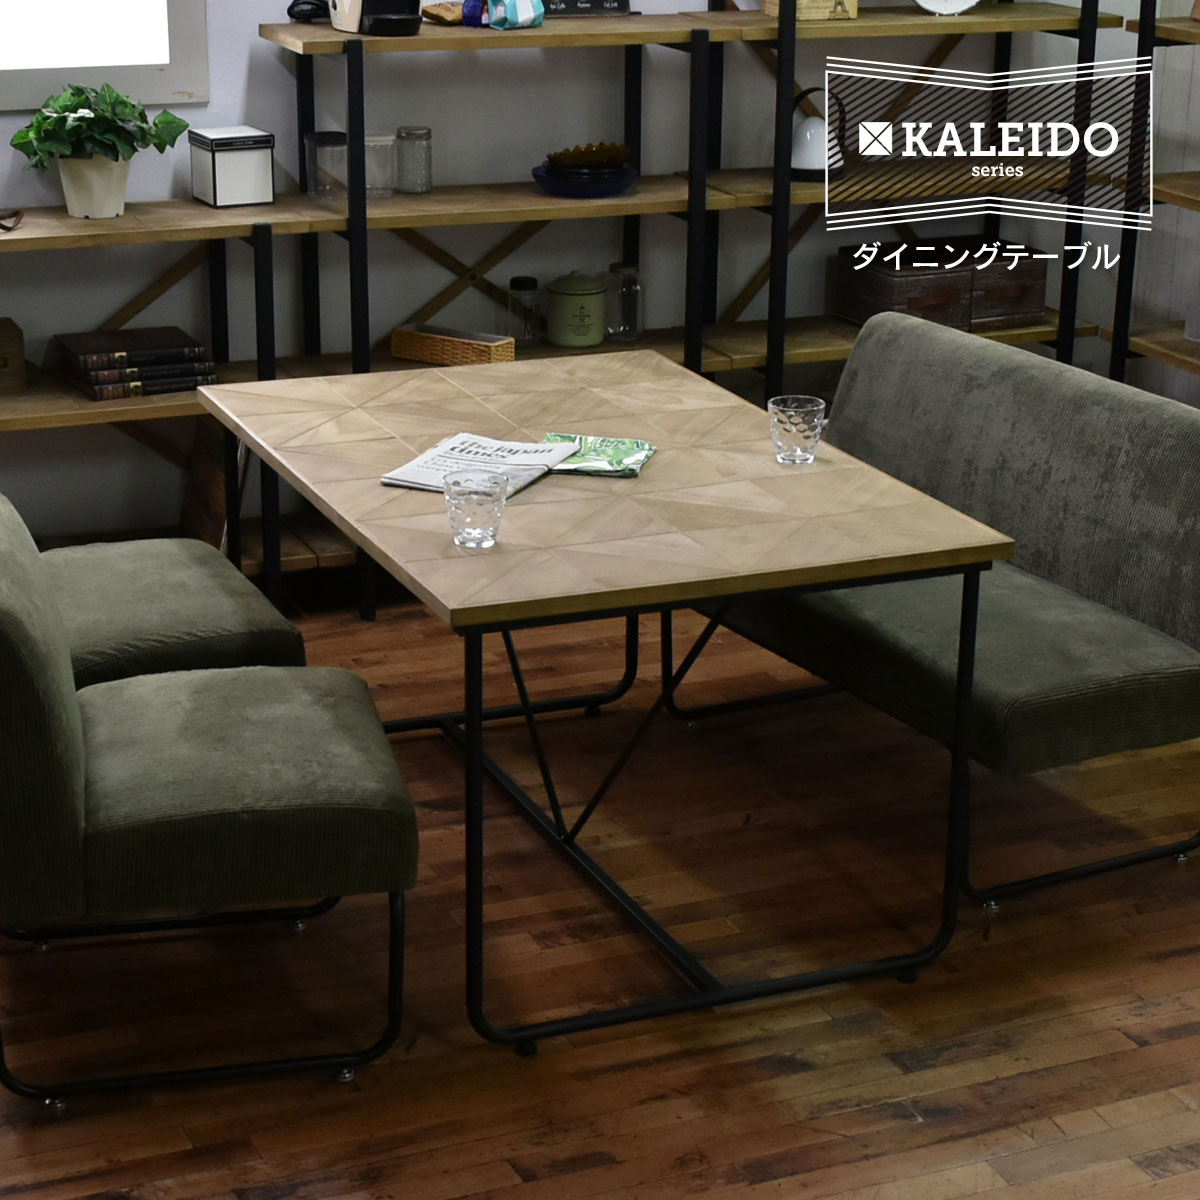 KALEIDO カレイド ダイニングテーブル